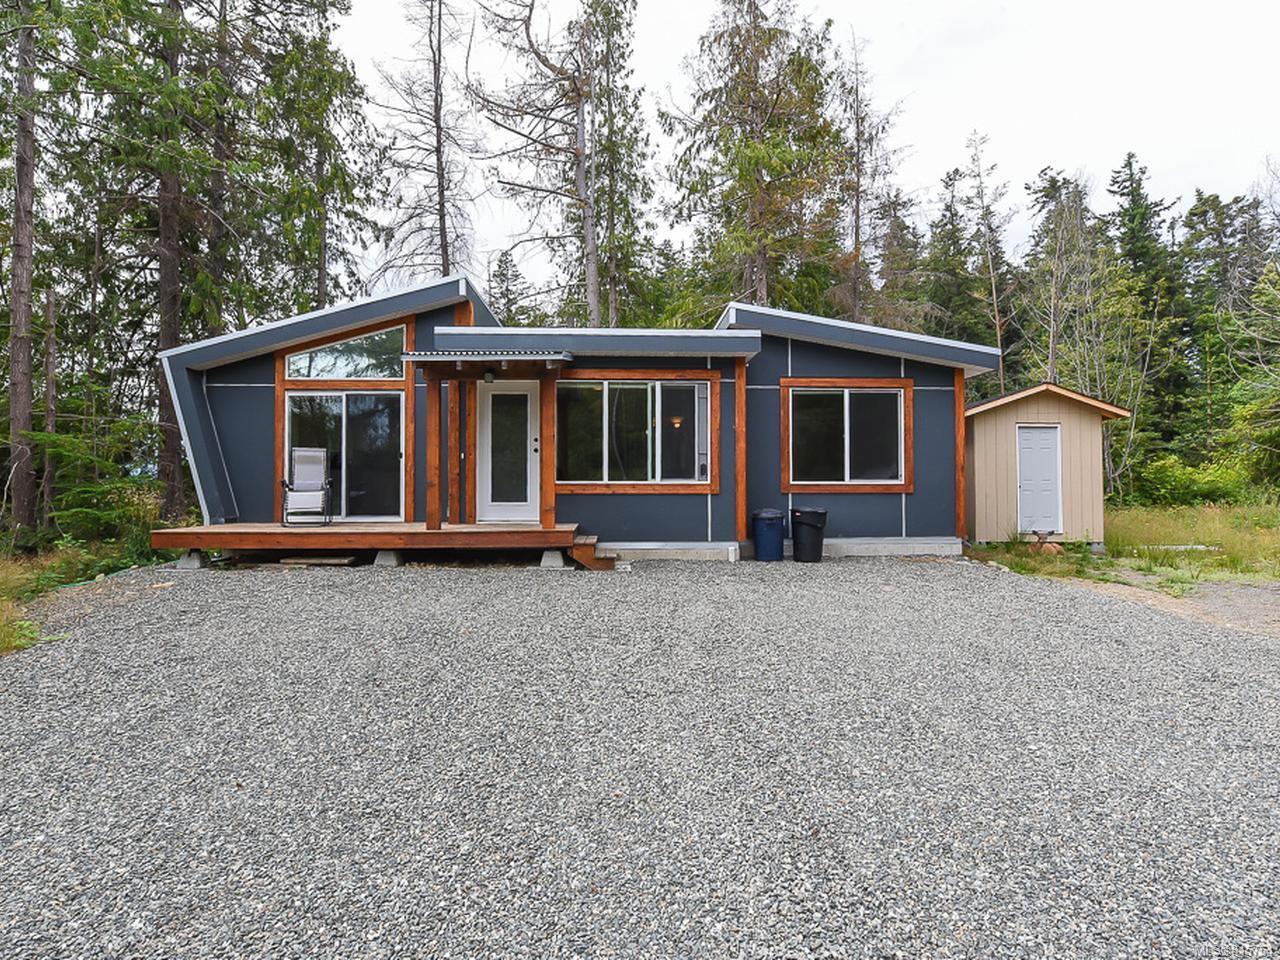 Main Photo: 1287 KYE BAY ROAD in COMOX: CV Comox Peninsula House for sale (Comox Valley)  : MLS®# 815754